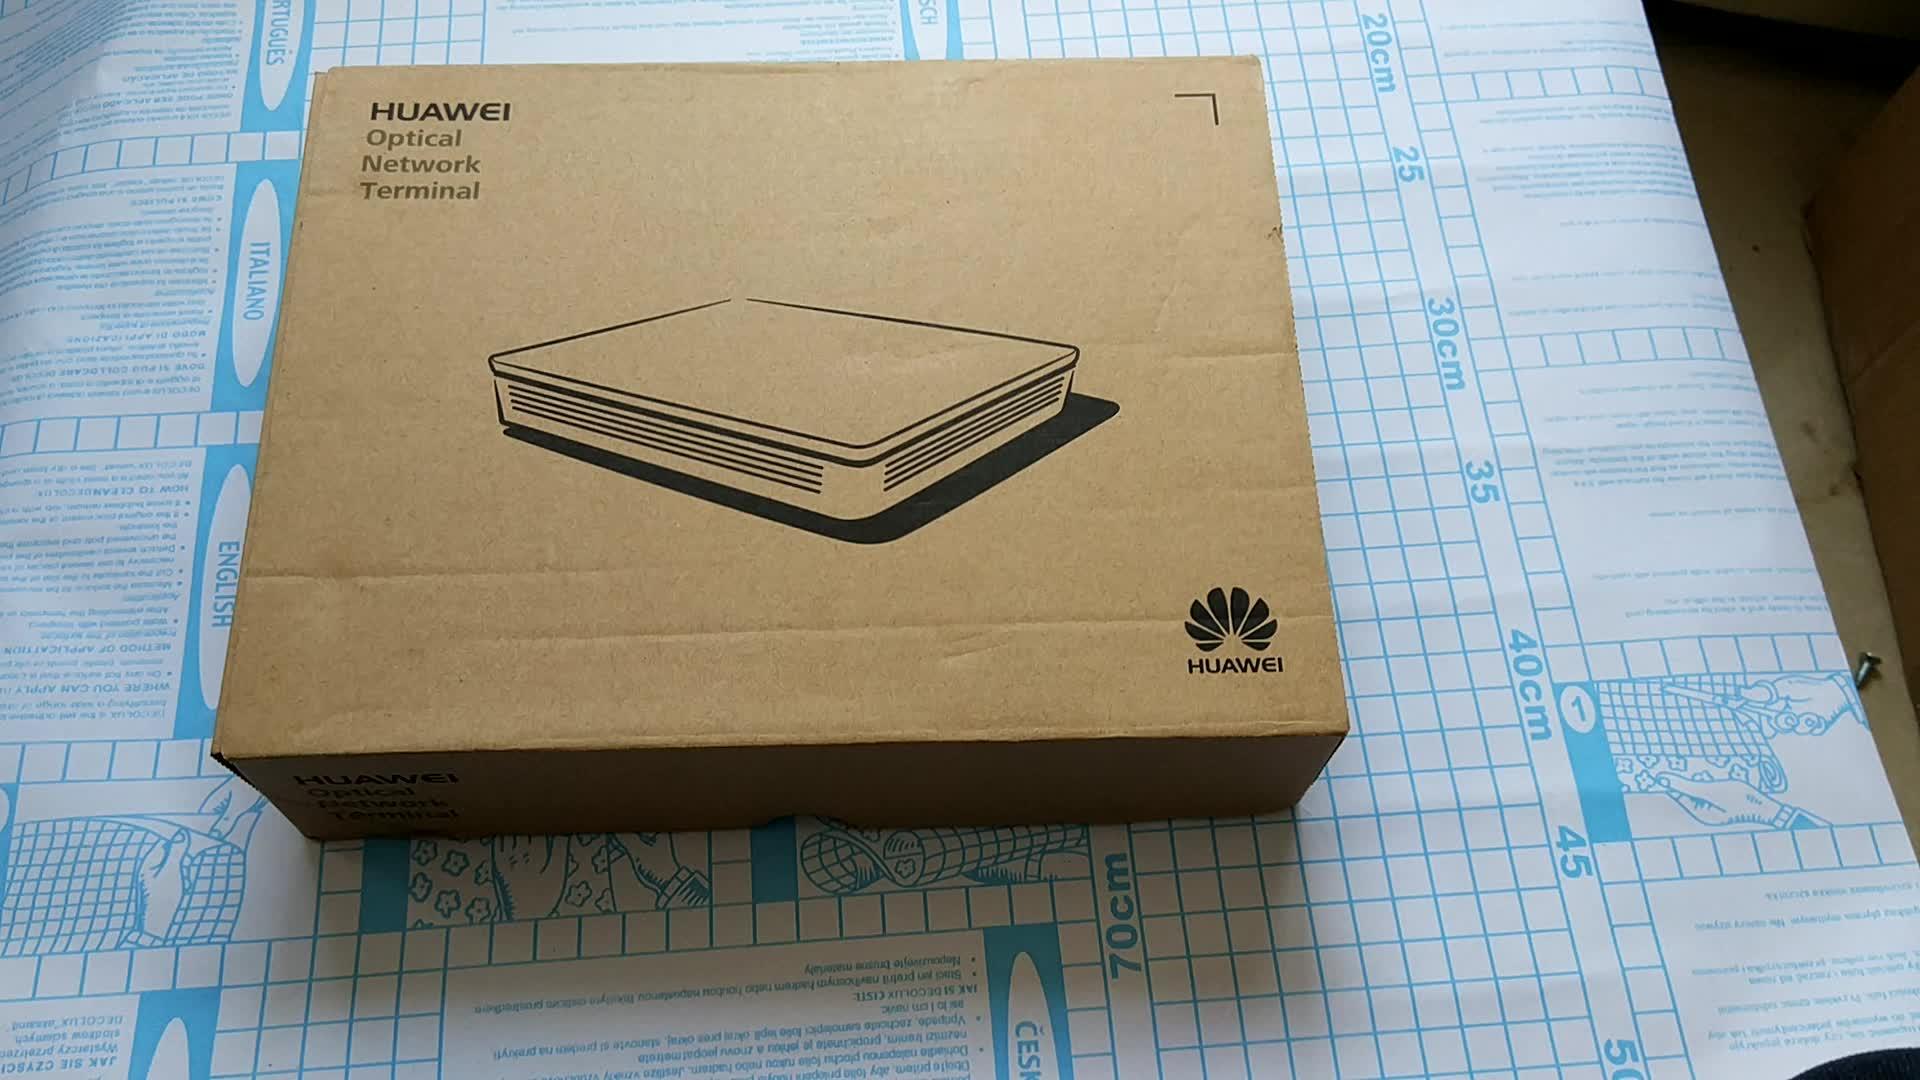 Лидер продаж Huawei HG8240H GPON ОНУ английский настройки прошивки